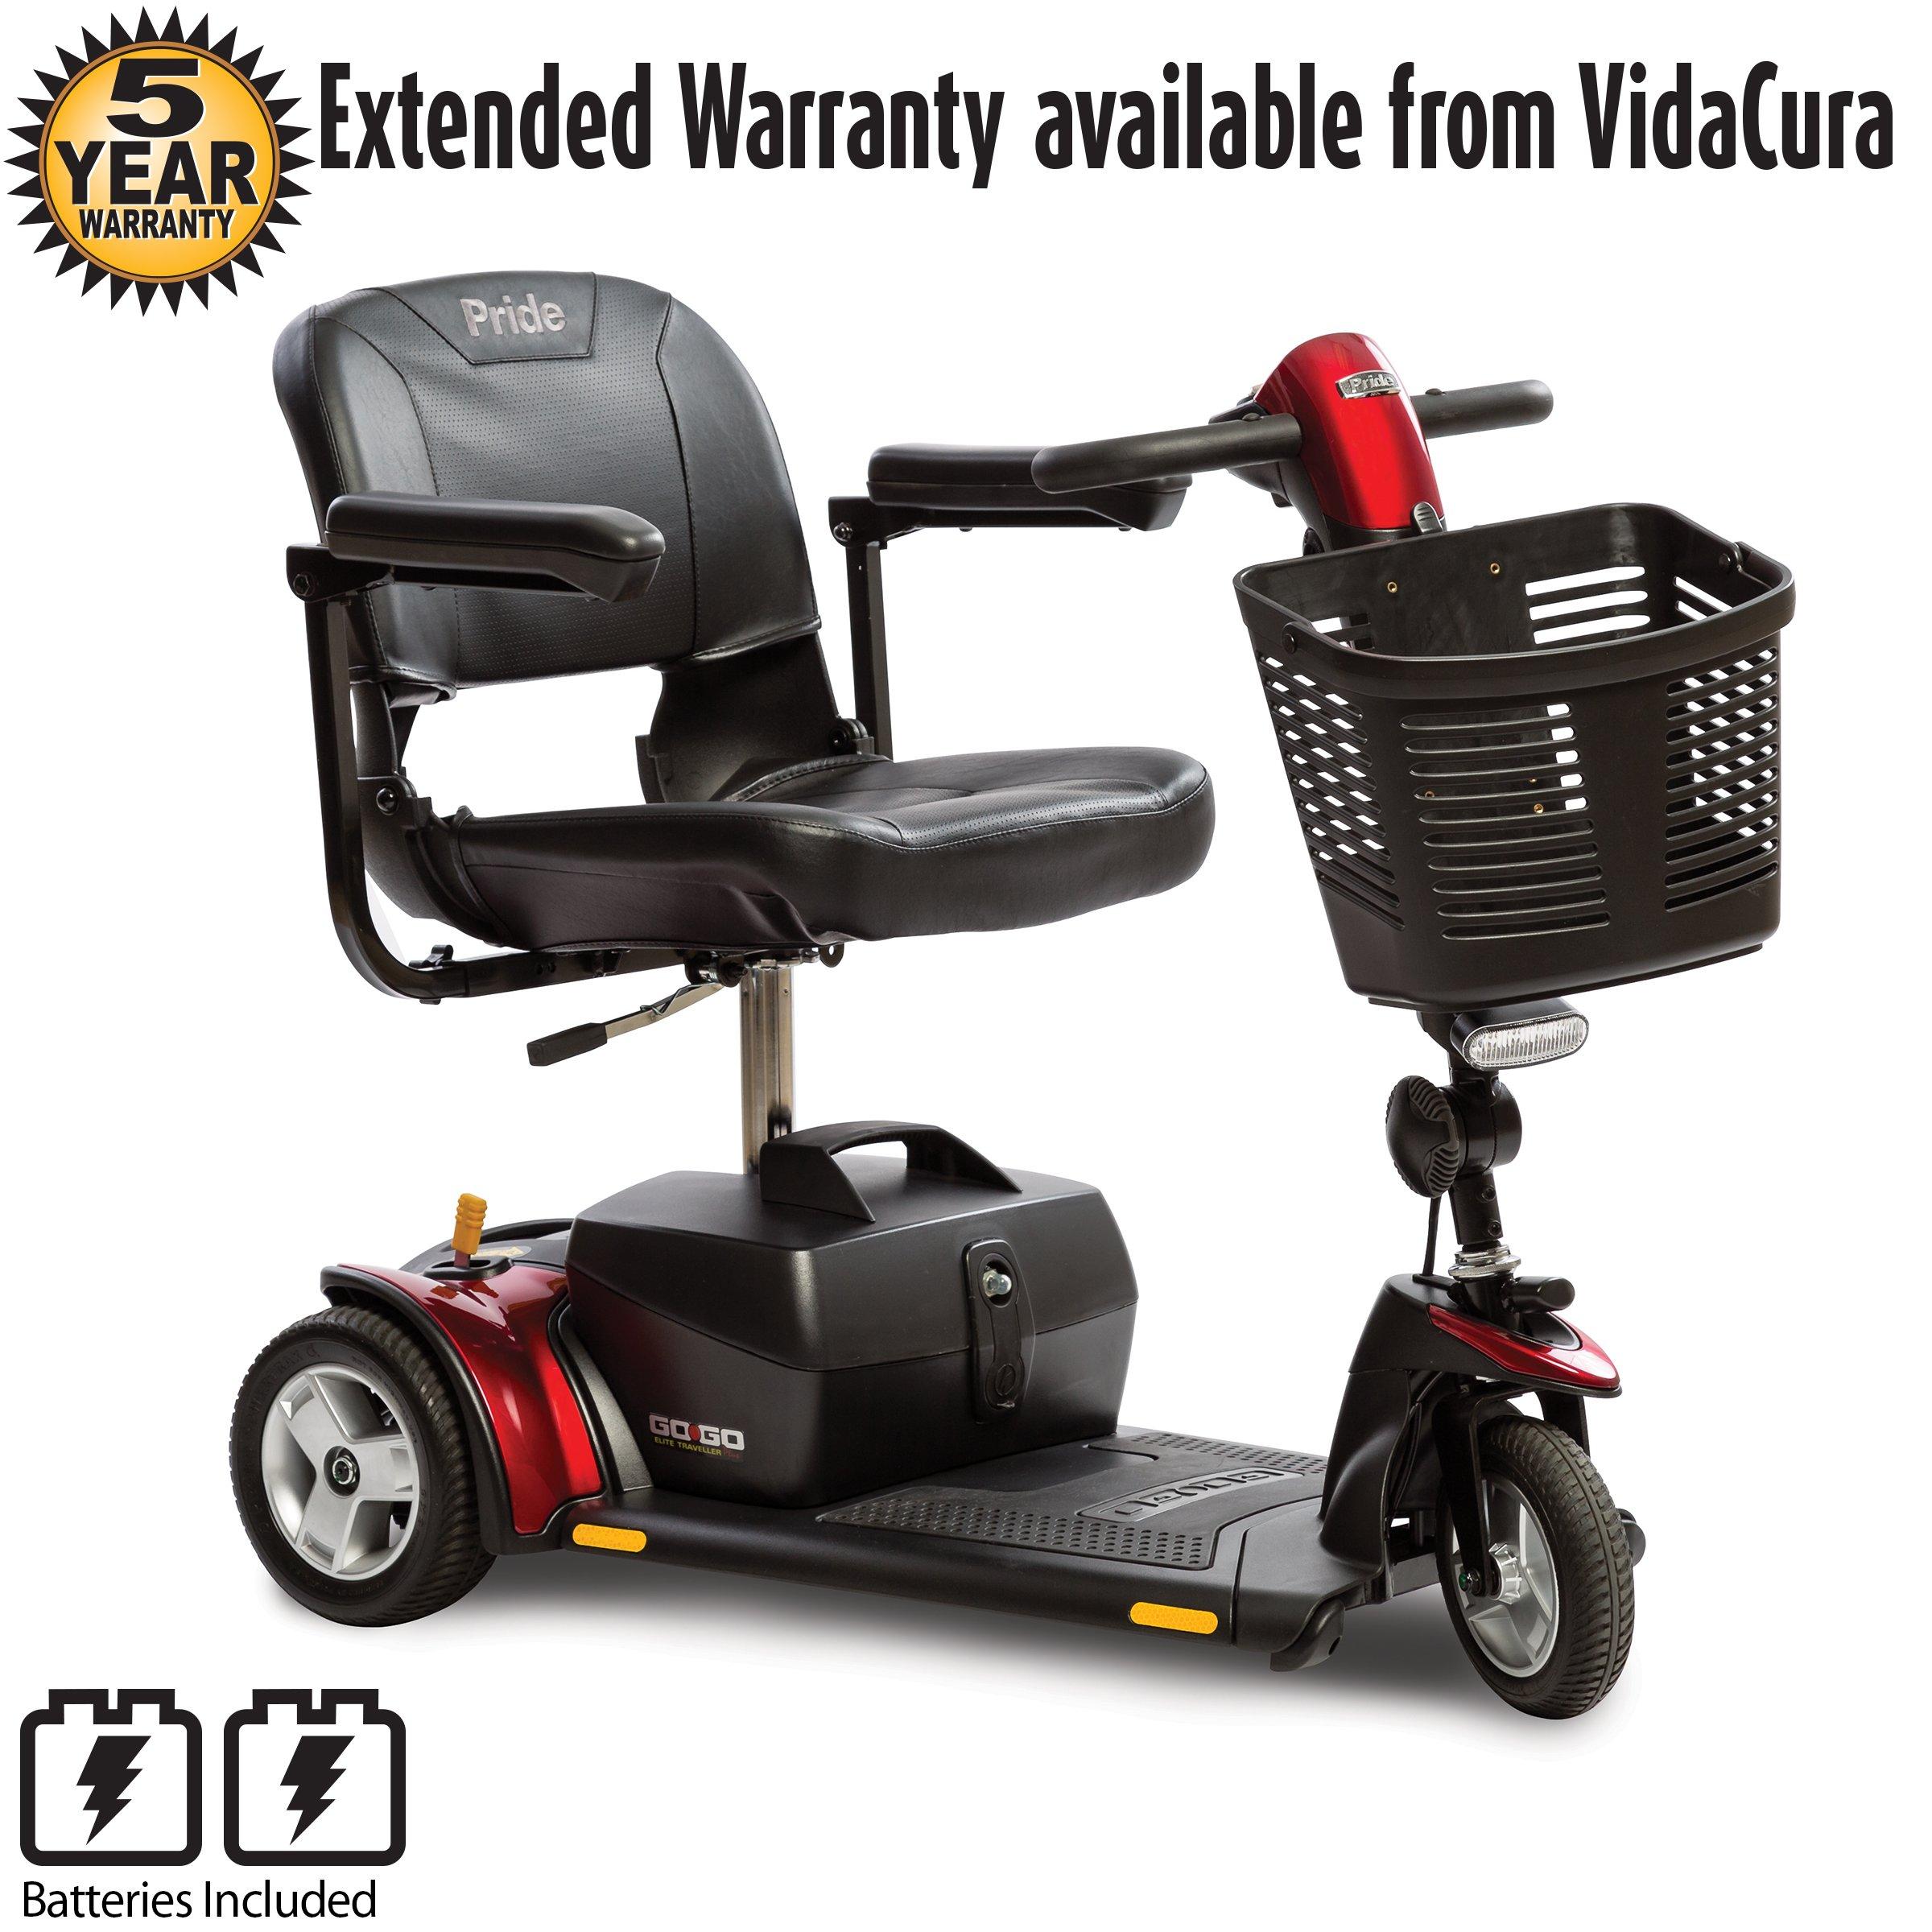 Pride Go-Go Elite Traveller Plus 3-Wheel Travel Scooter w/ avail ext warr